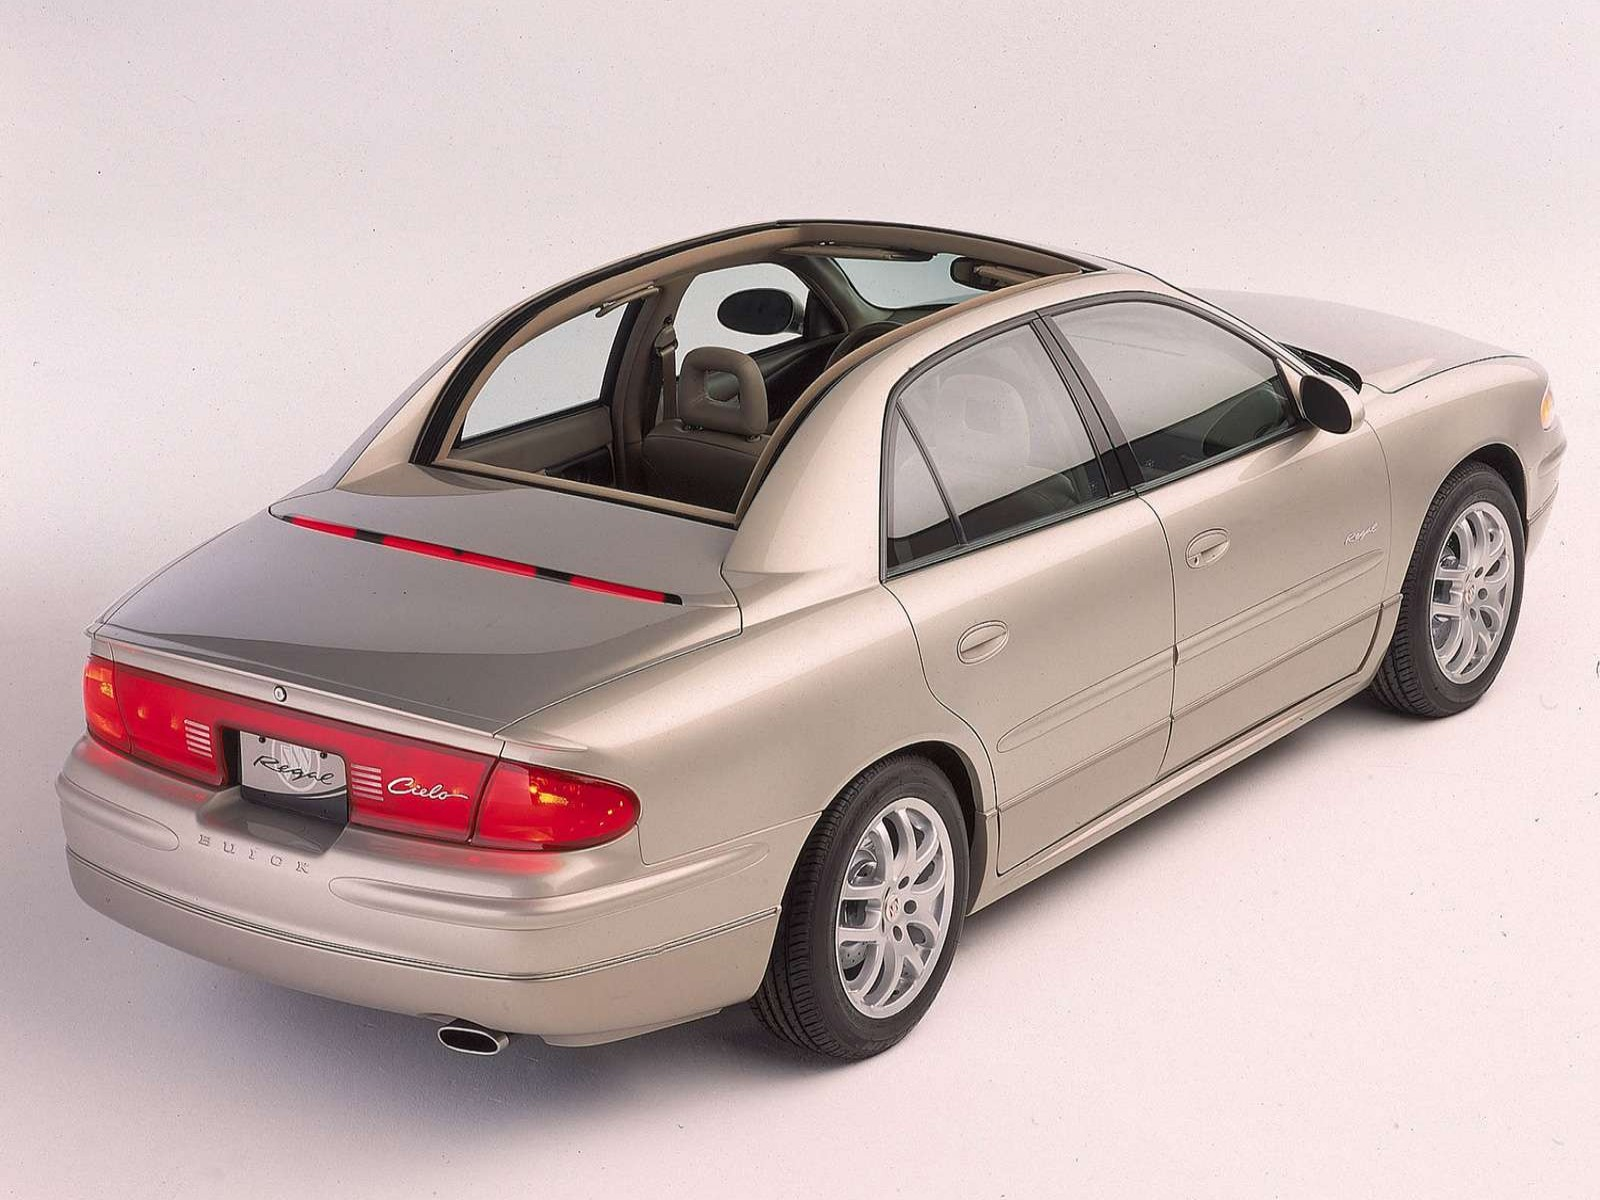 http://3.bp.blogspot.com/--SK1h73yslc/TqHCdWZ4N_I/AAAAAAAAARA/cNeRPlA78HA/s1600/Buick+Regal+Cielo+Concept+2000+03.jpg